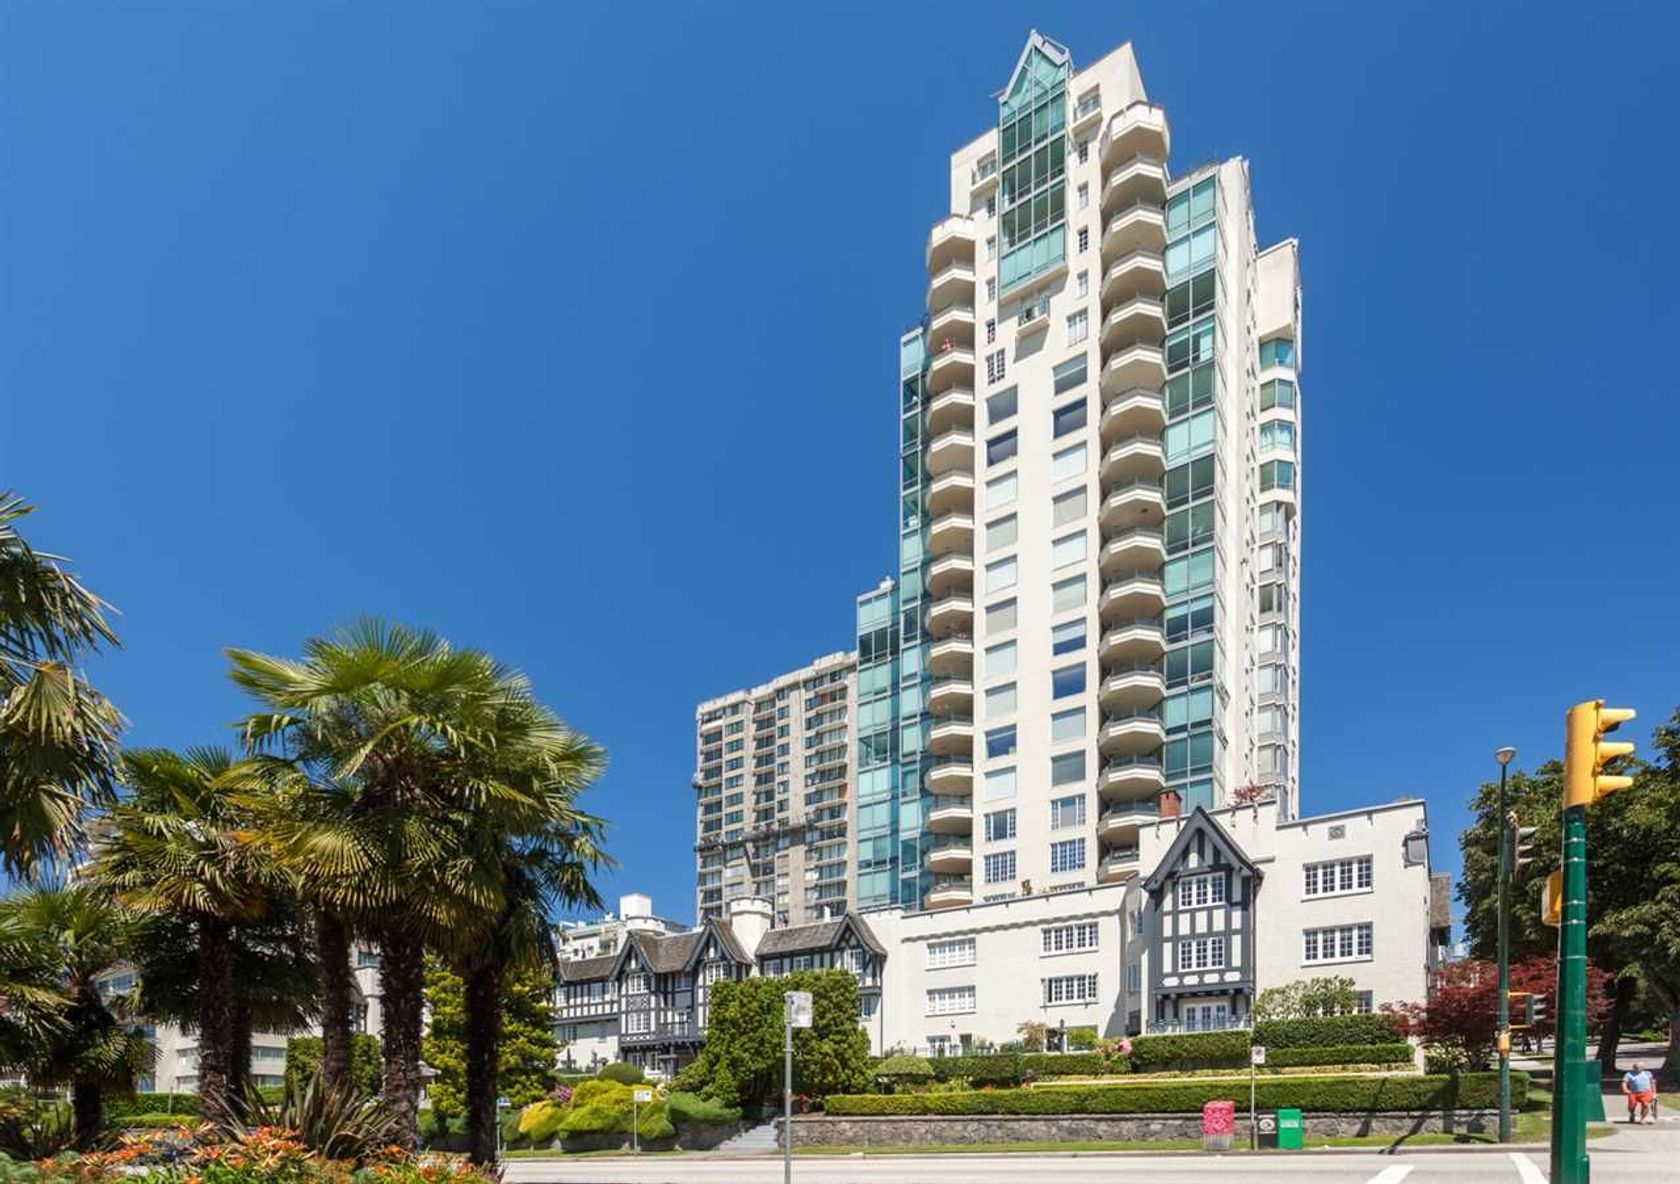 1311-beach-avenue-west-end-vw-vancouver-west-36 at 1103 - 1311 Beach Avenue, Sunset Beach (West End VW), Vancouver West